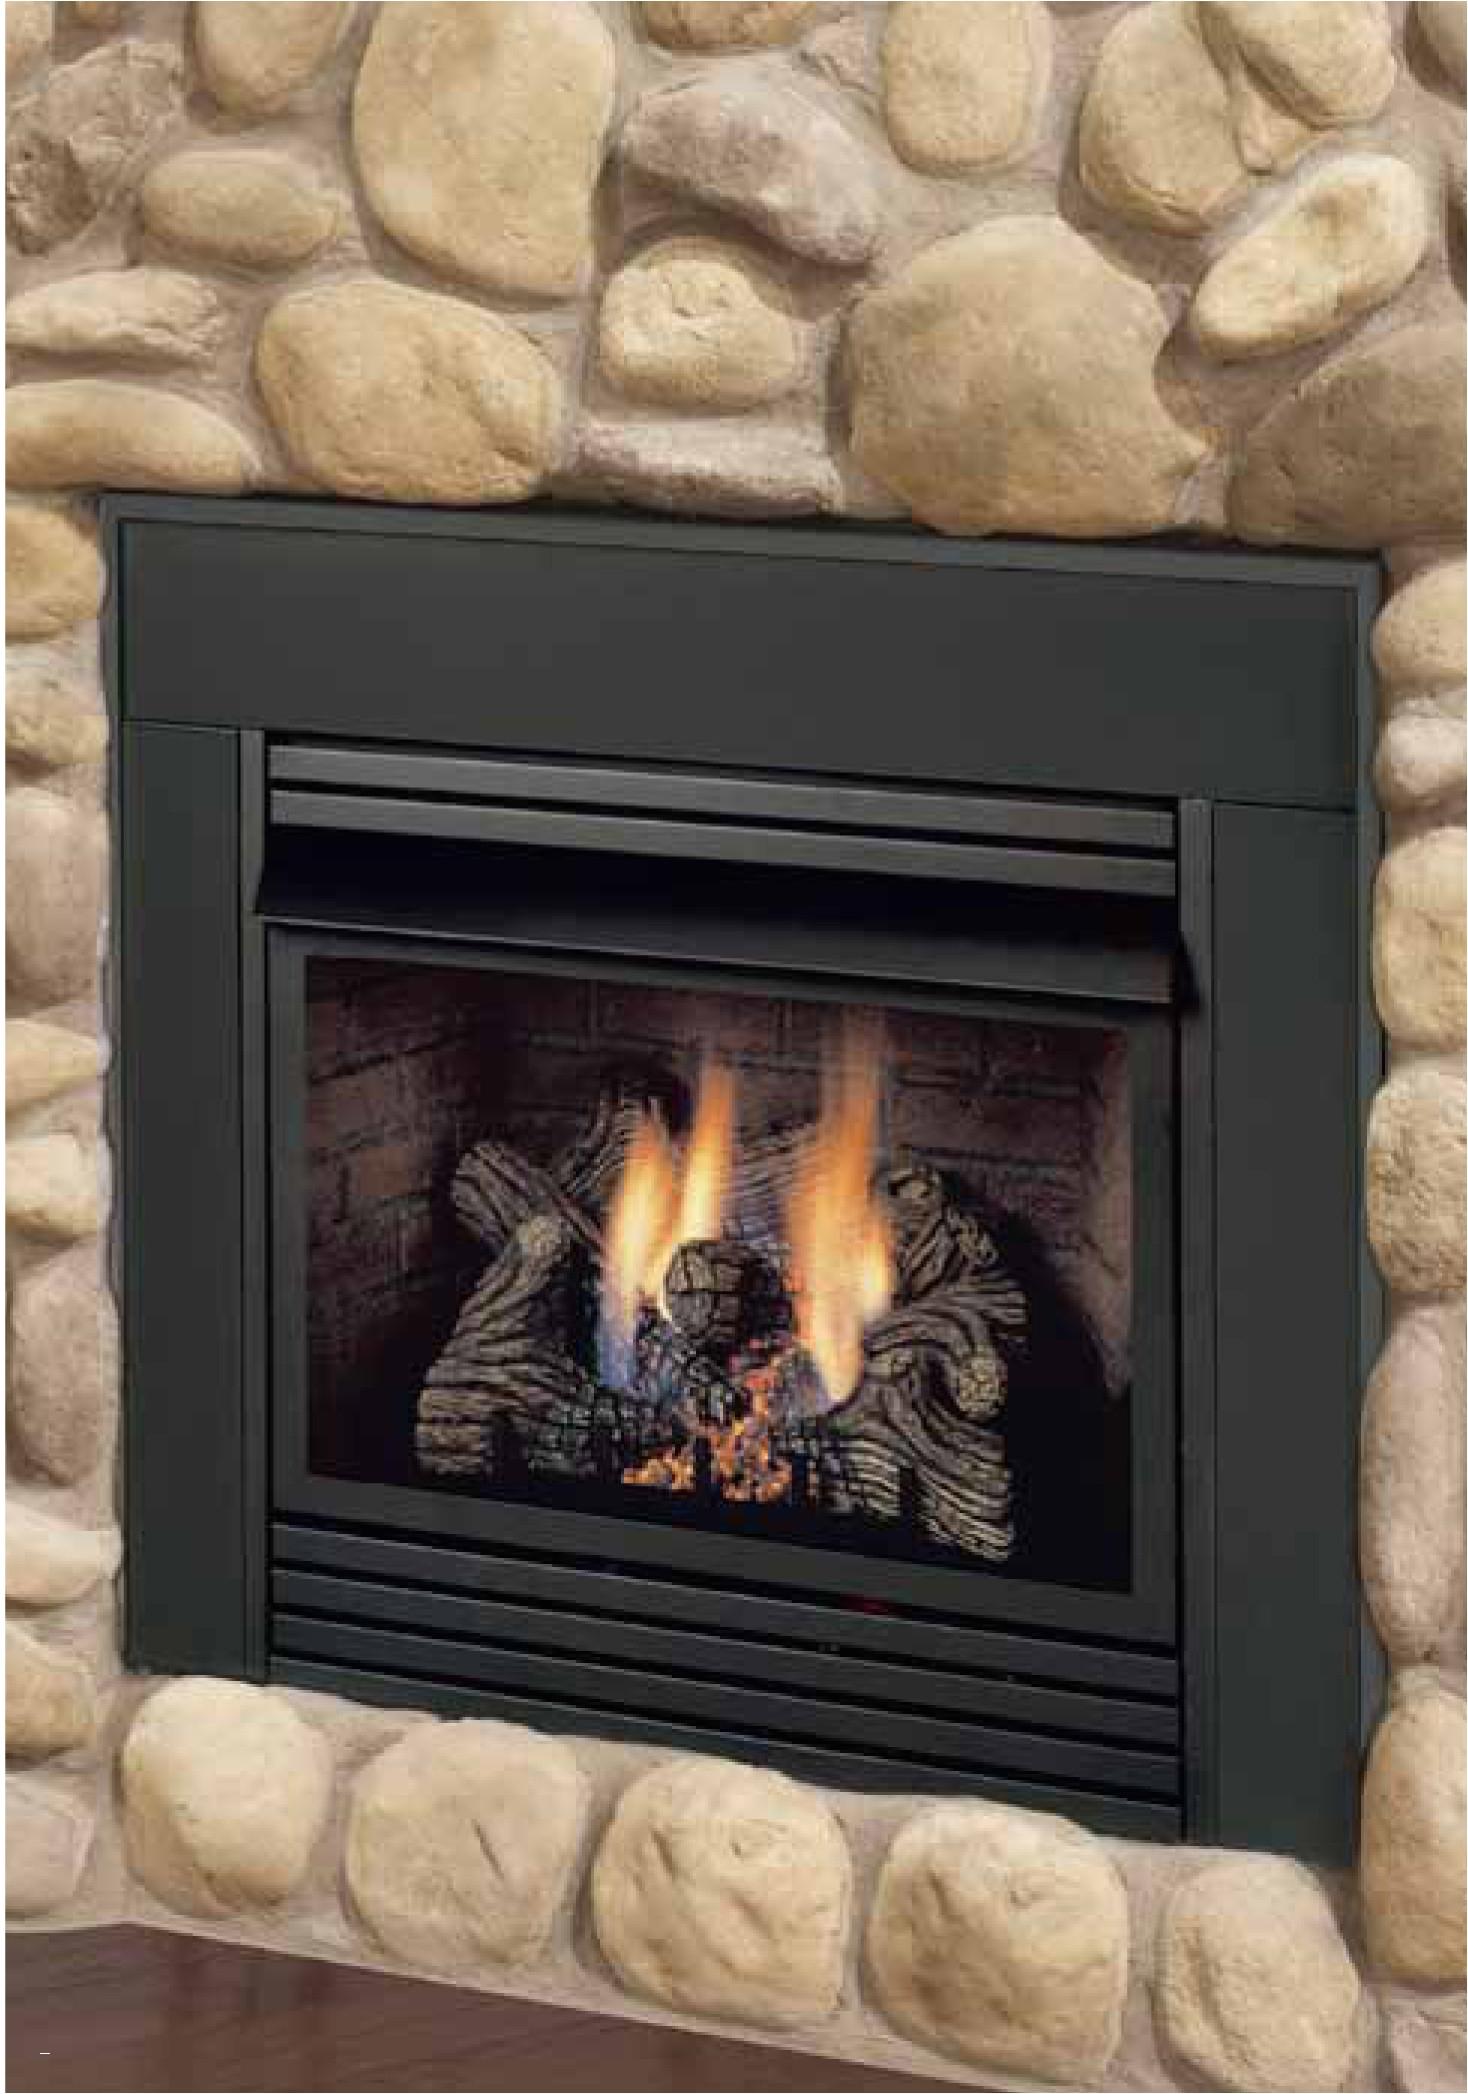 Installing A Vent Free Gas Fireplace Insert Propane Stylish Ventless Fireplaces